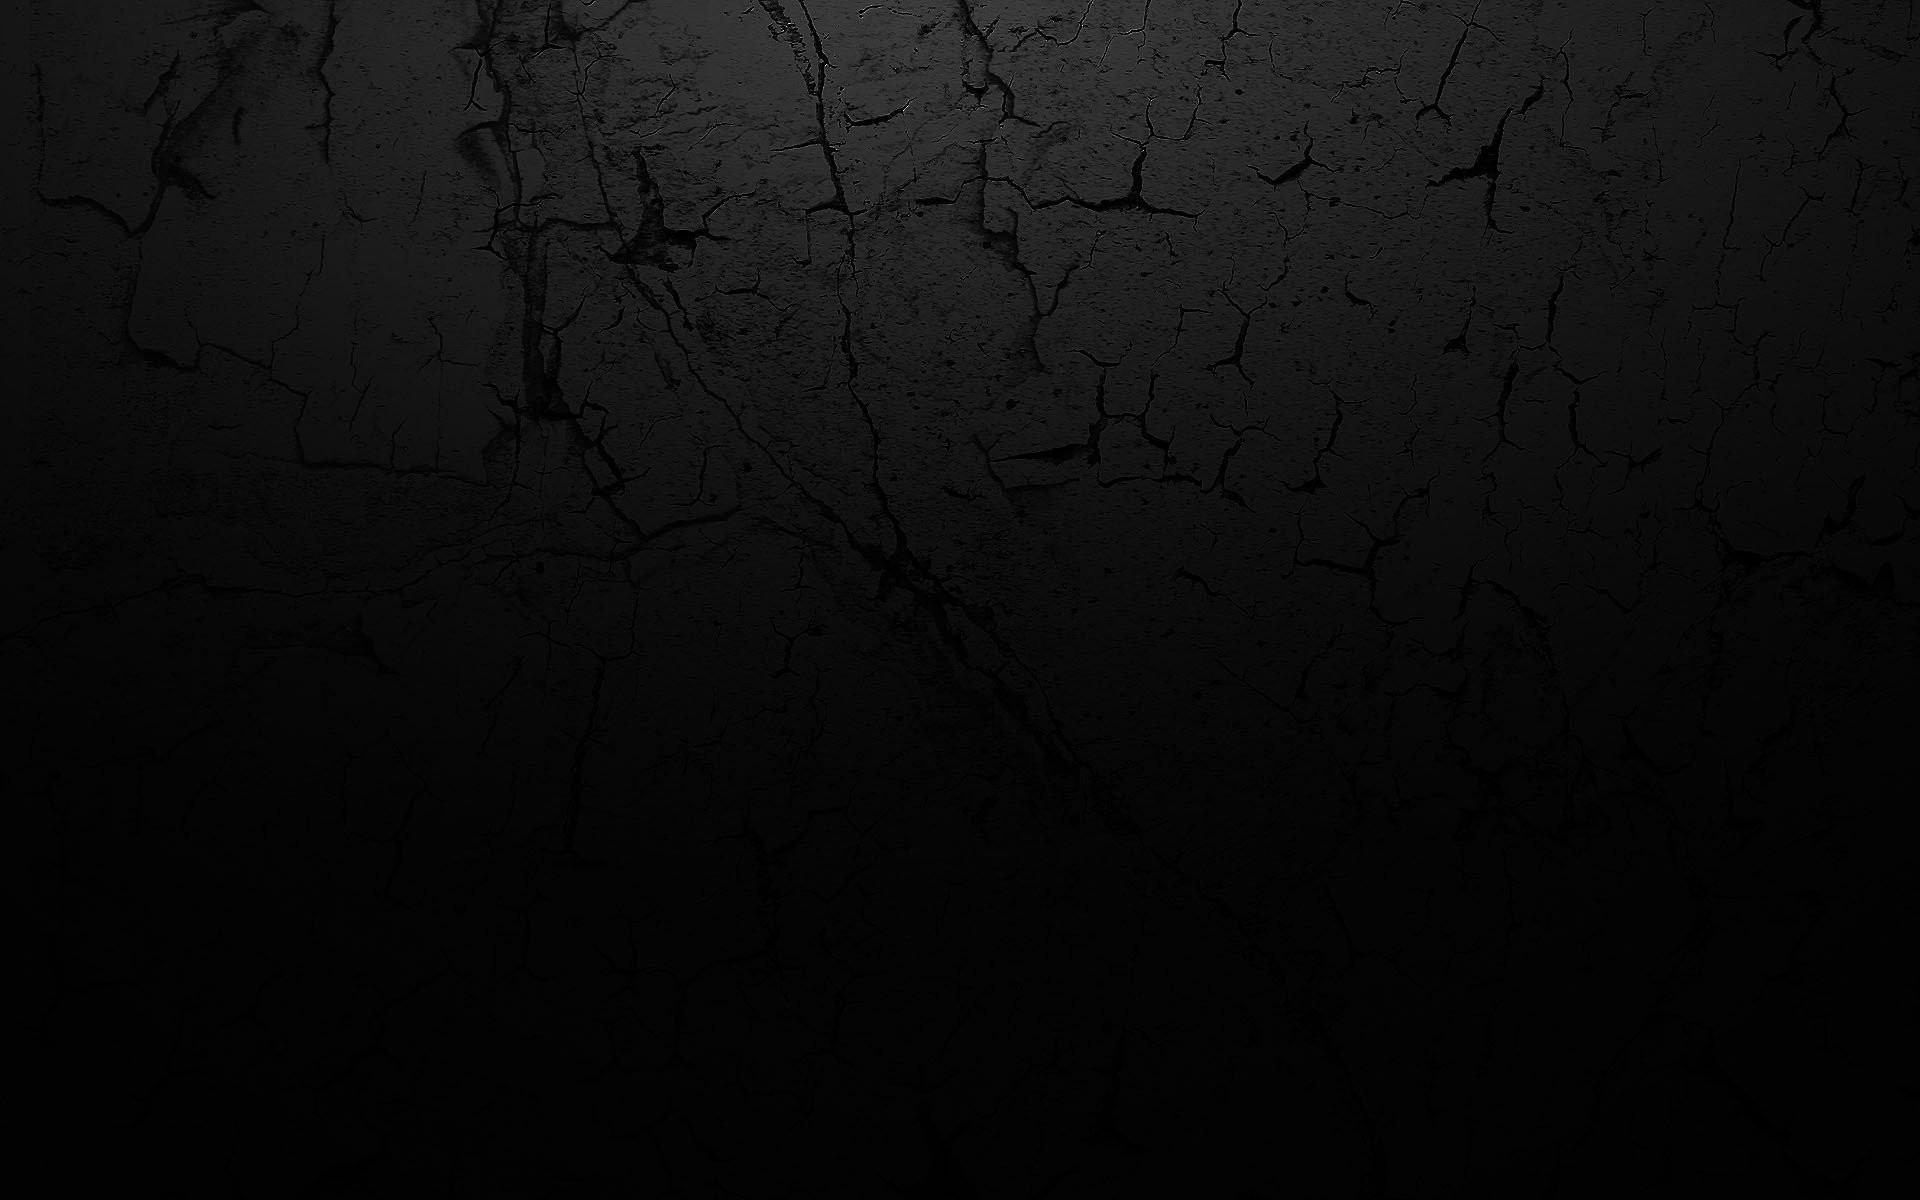 Wallpaper Of Sad Girl In Rain Tears Wallpapers 69 Images